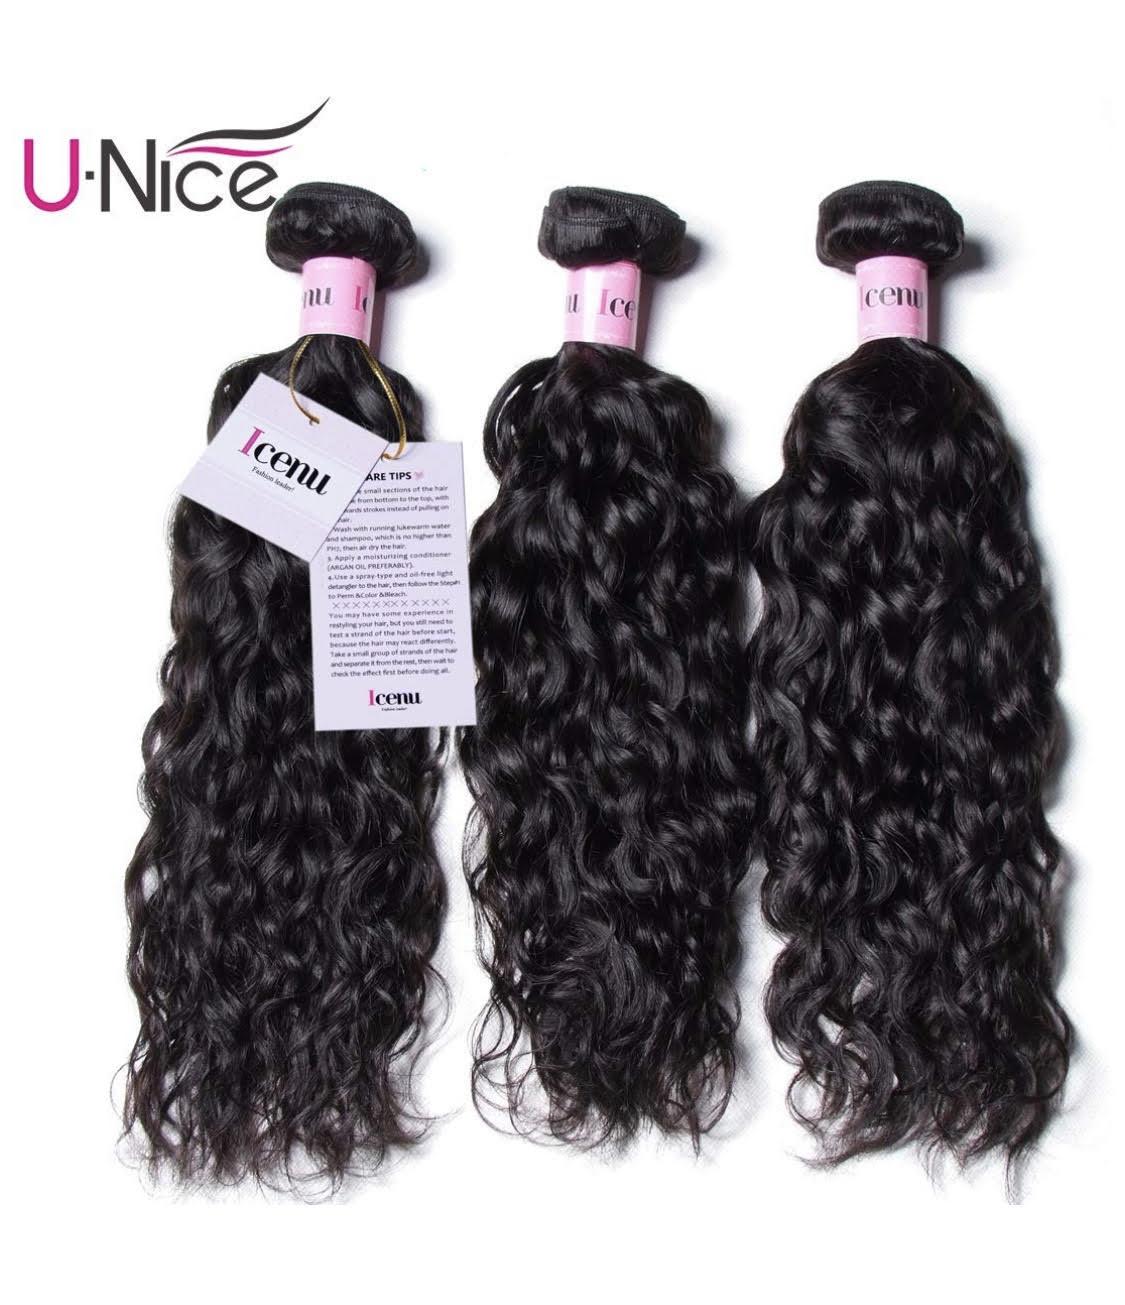 UNice Hair Icenu Series 8A Grade Brazilian Water Wave 3 Bundles 100% Unprocessed Virgin Human Hair Weave Extensions (22 24 26, Natural Color)